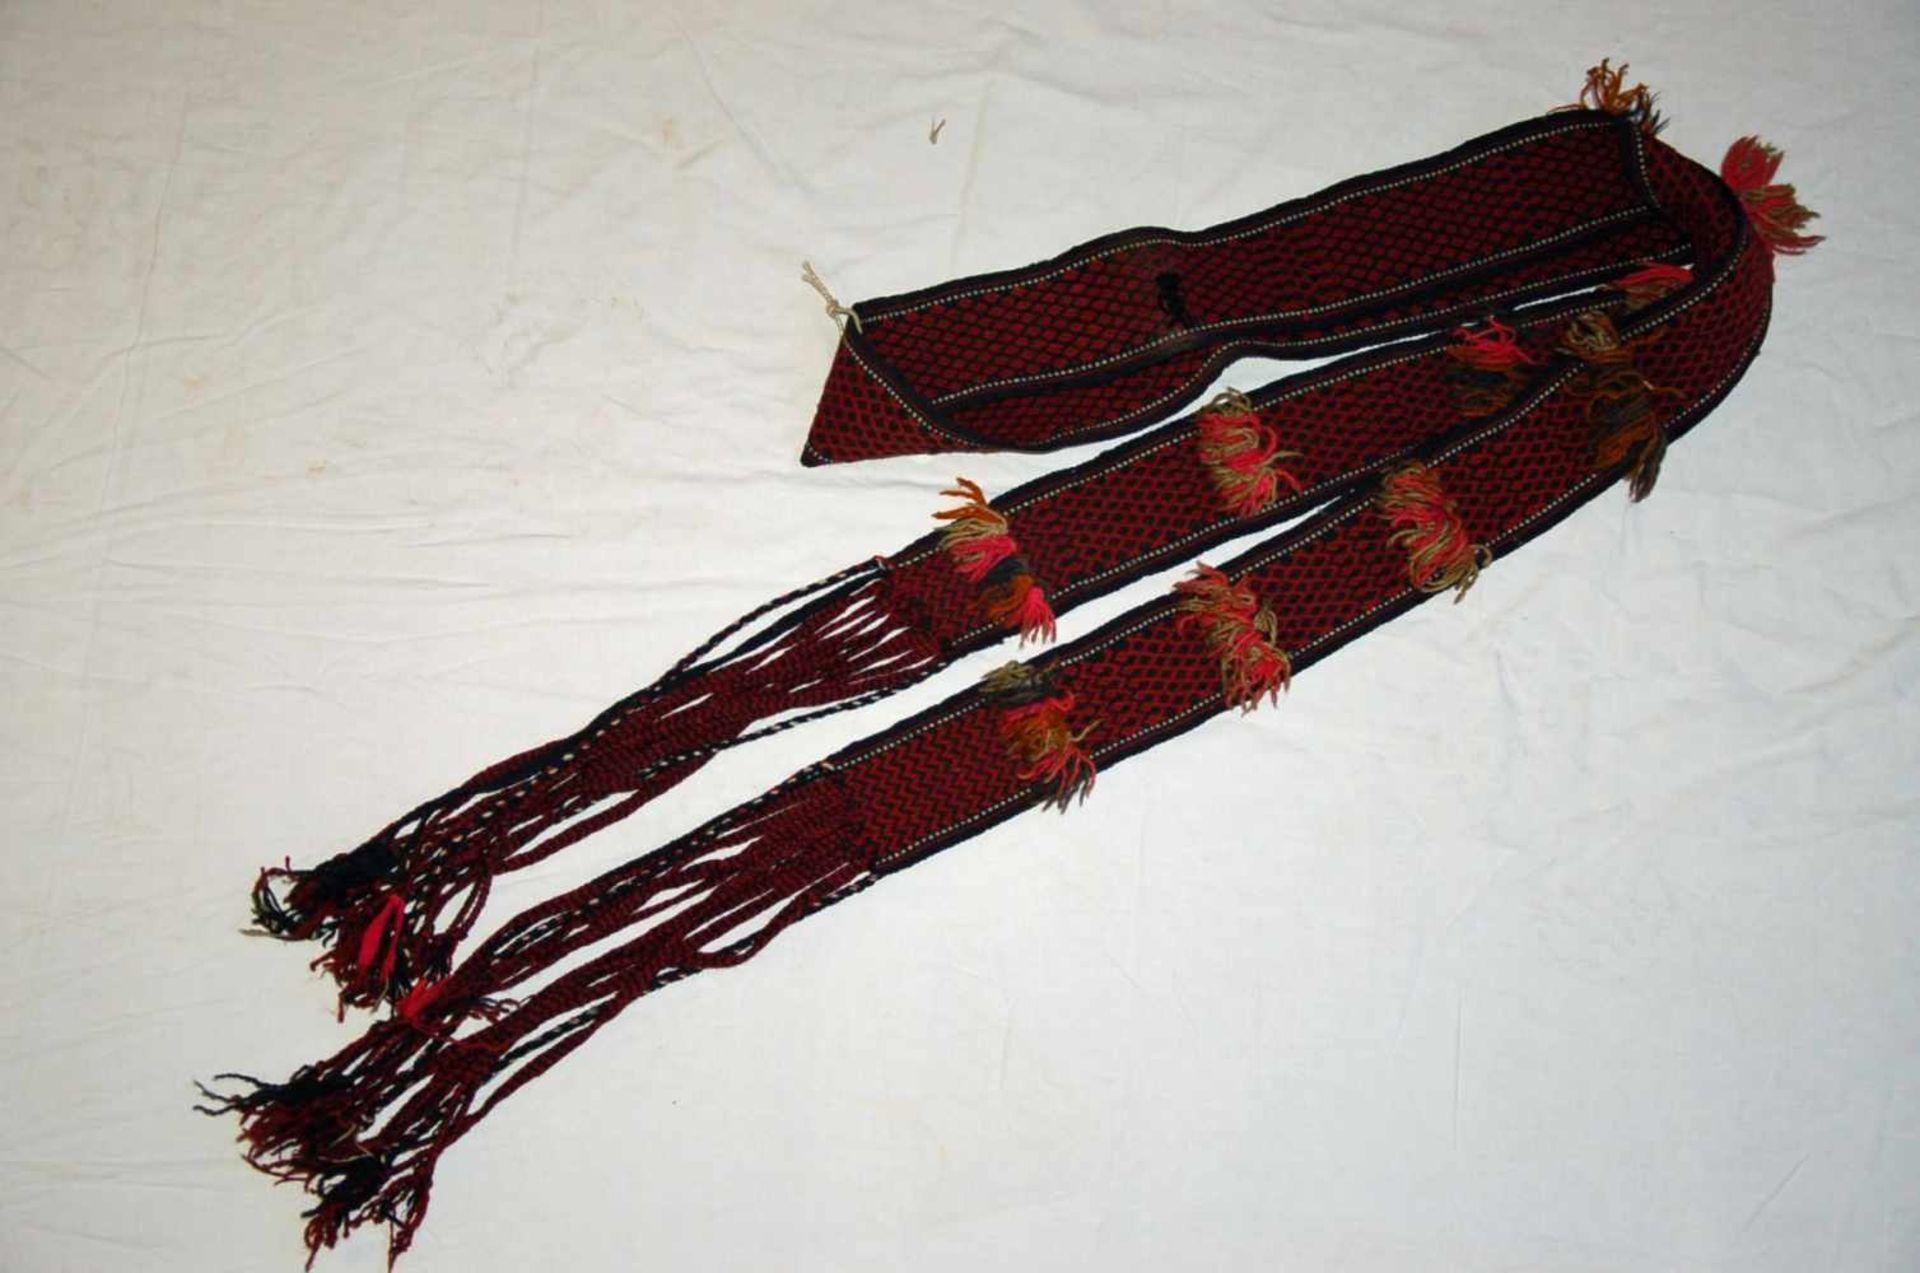 Kibitka-Schmuckband/ Zeltband, Turkmenistanca. 145 x 34 cm.